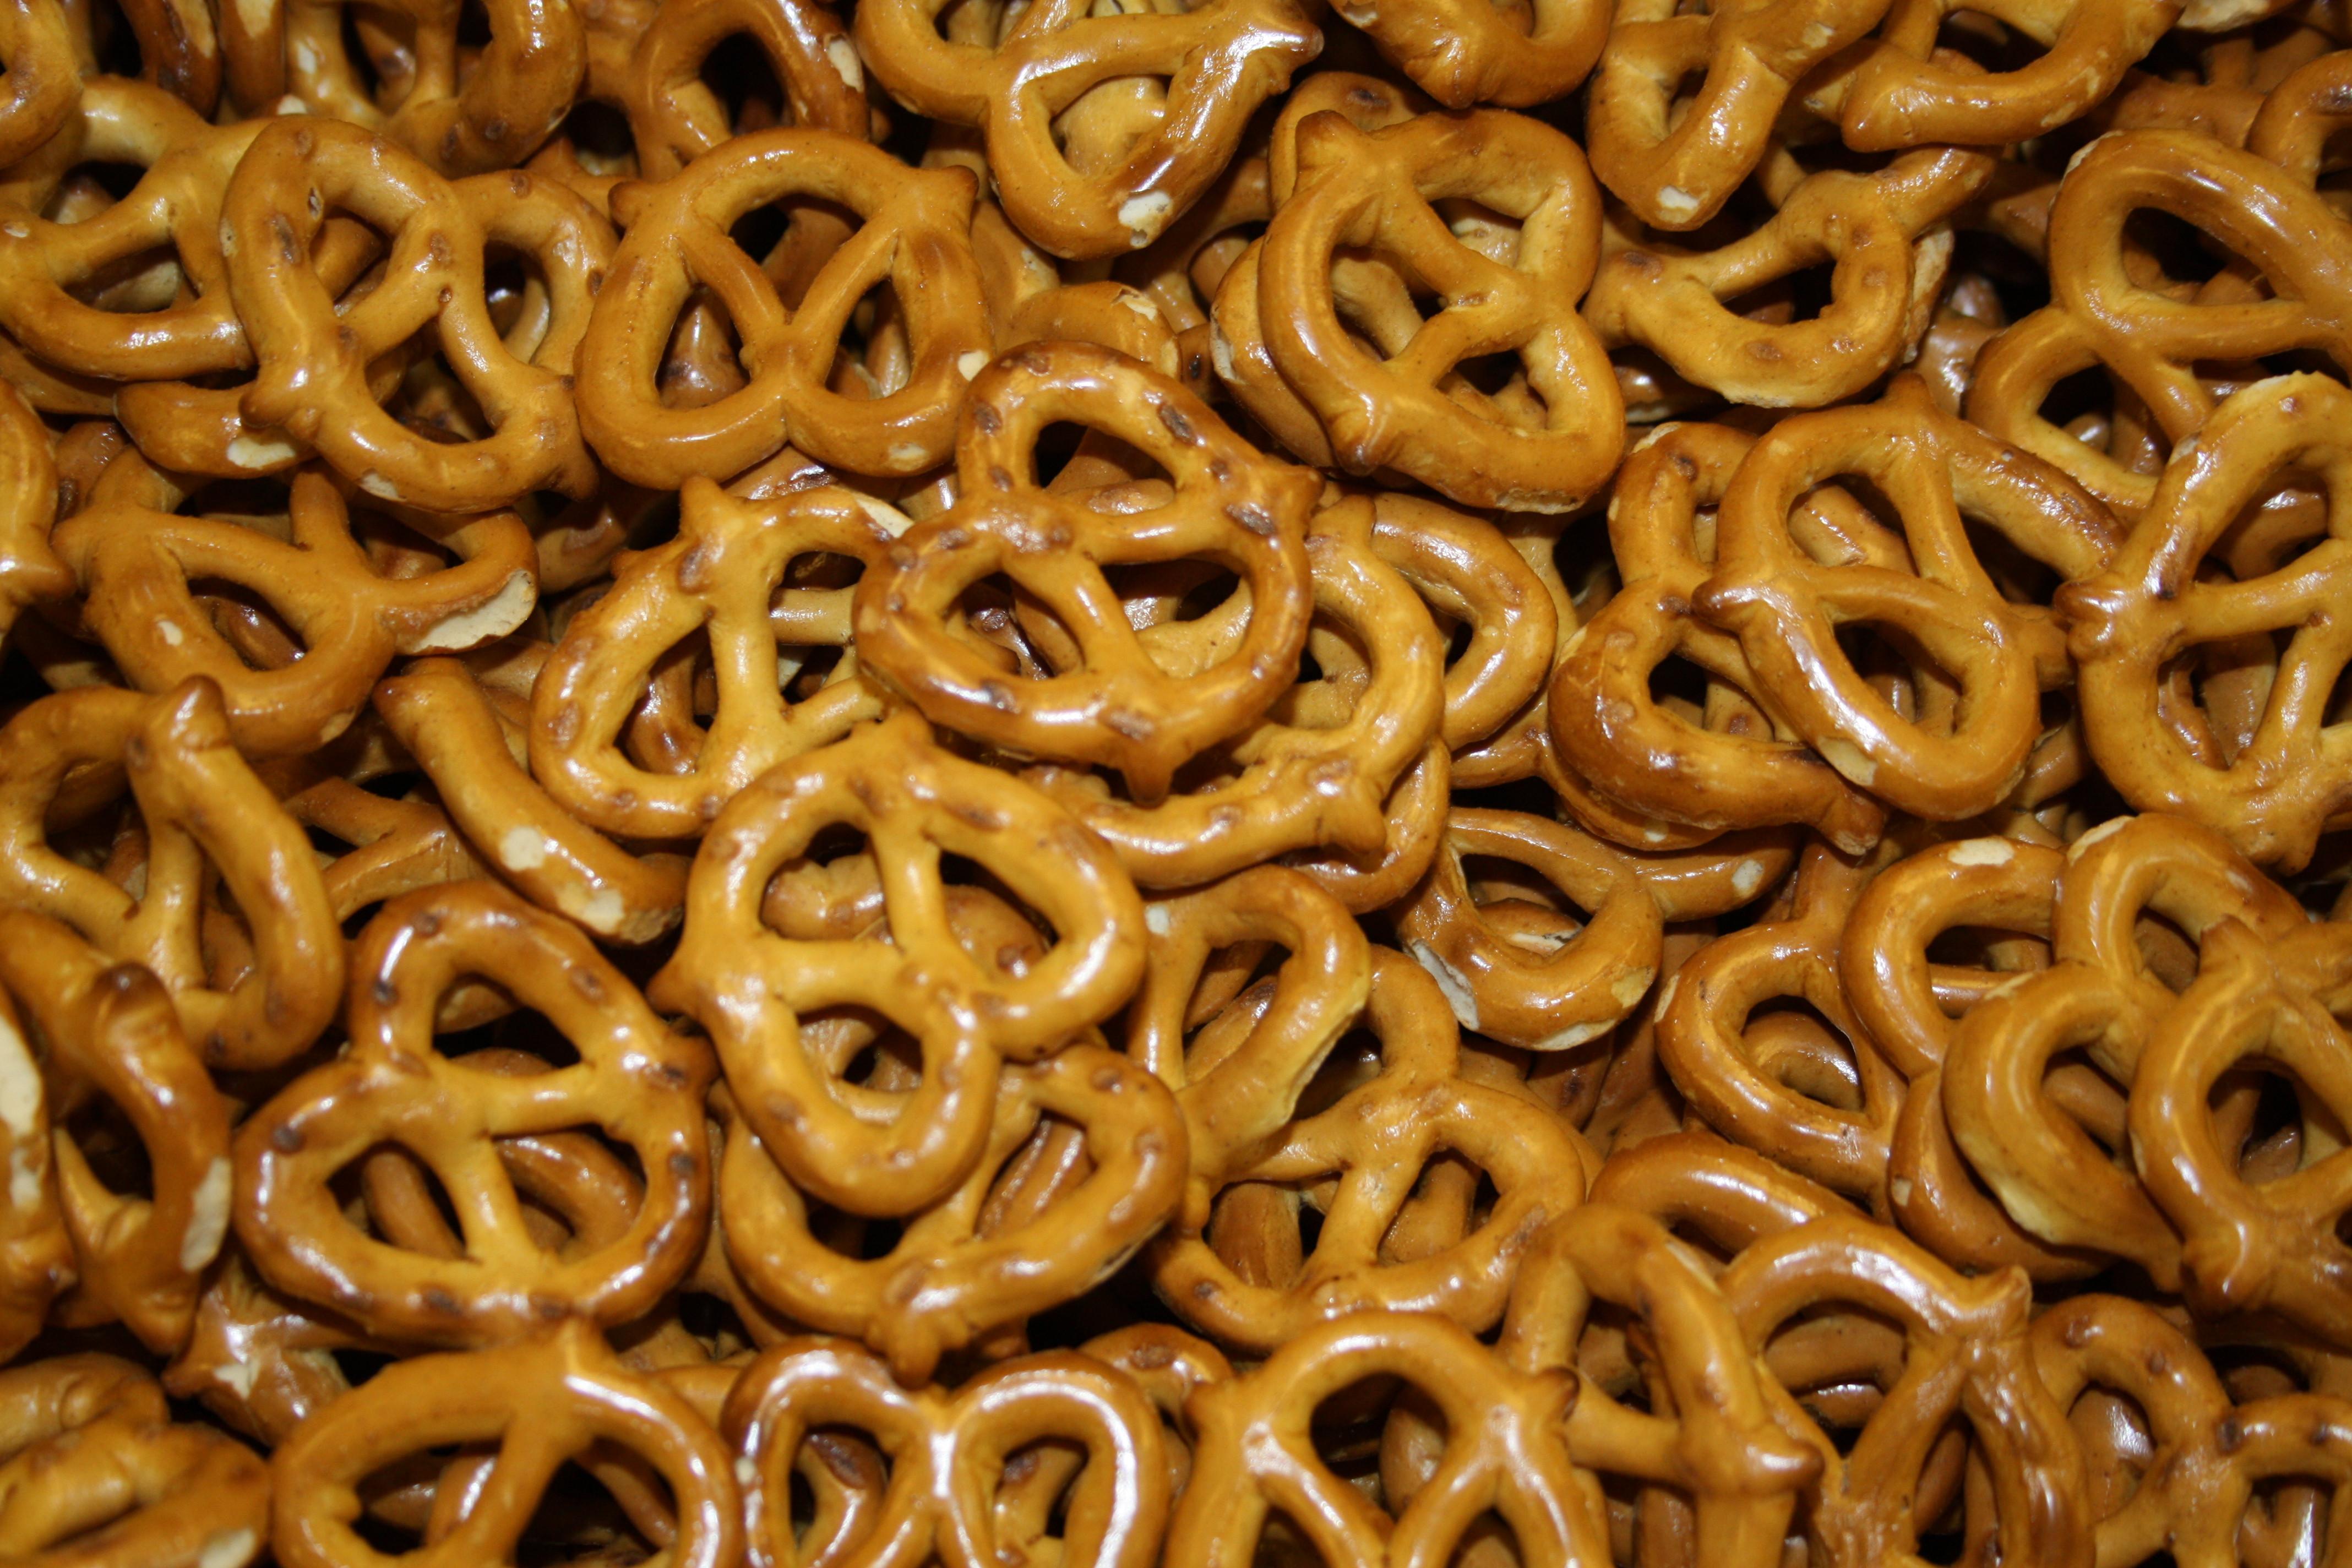 Unsalted Pretzels Healthy  Unsalted Pretzels